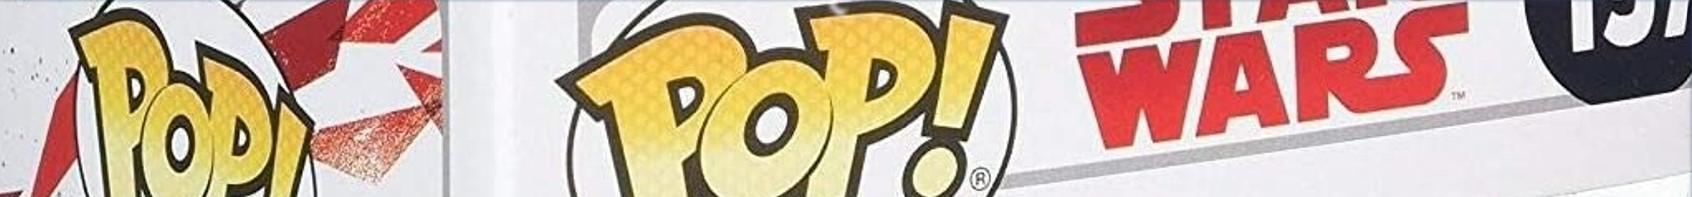 Star Wars Funko Pops (2017)